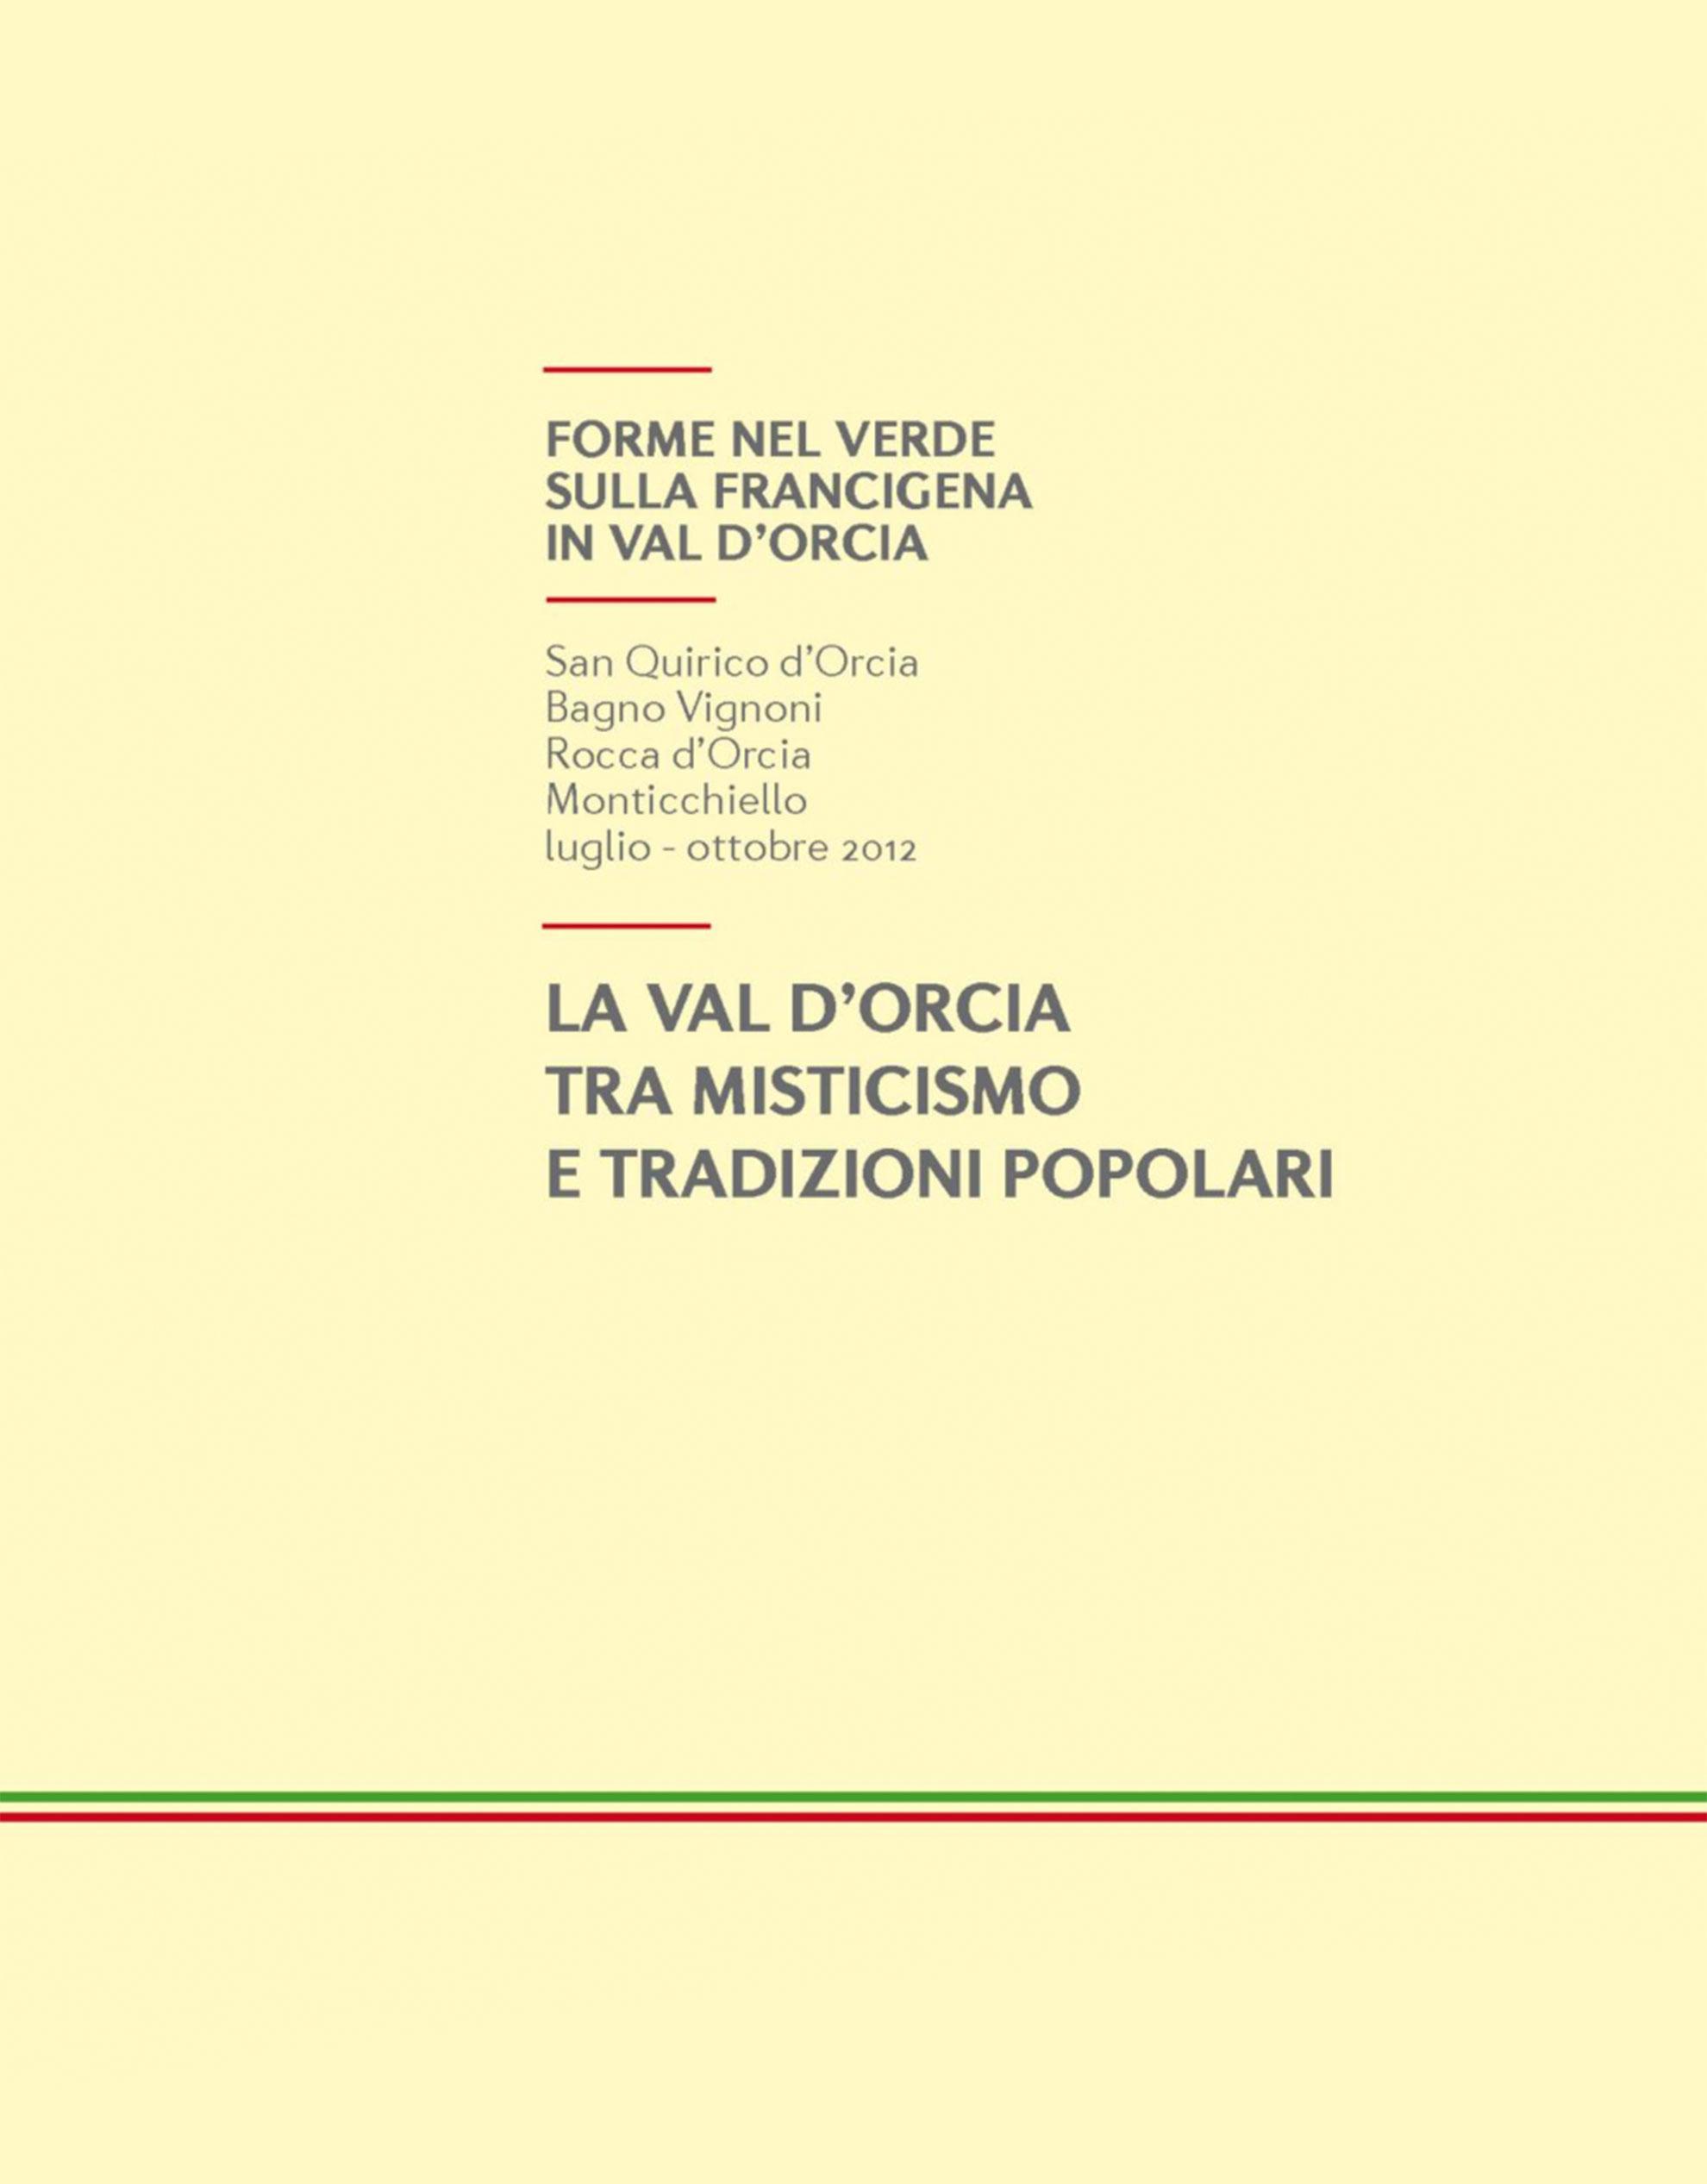 Catalogo Forme nel Verde 2012